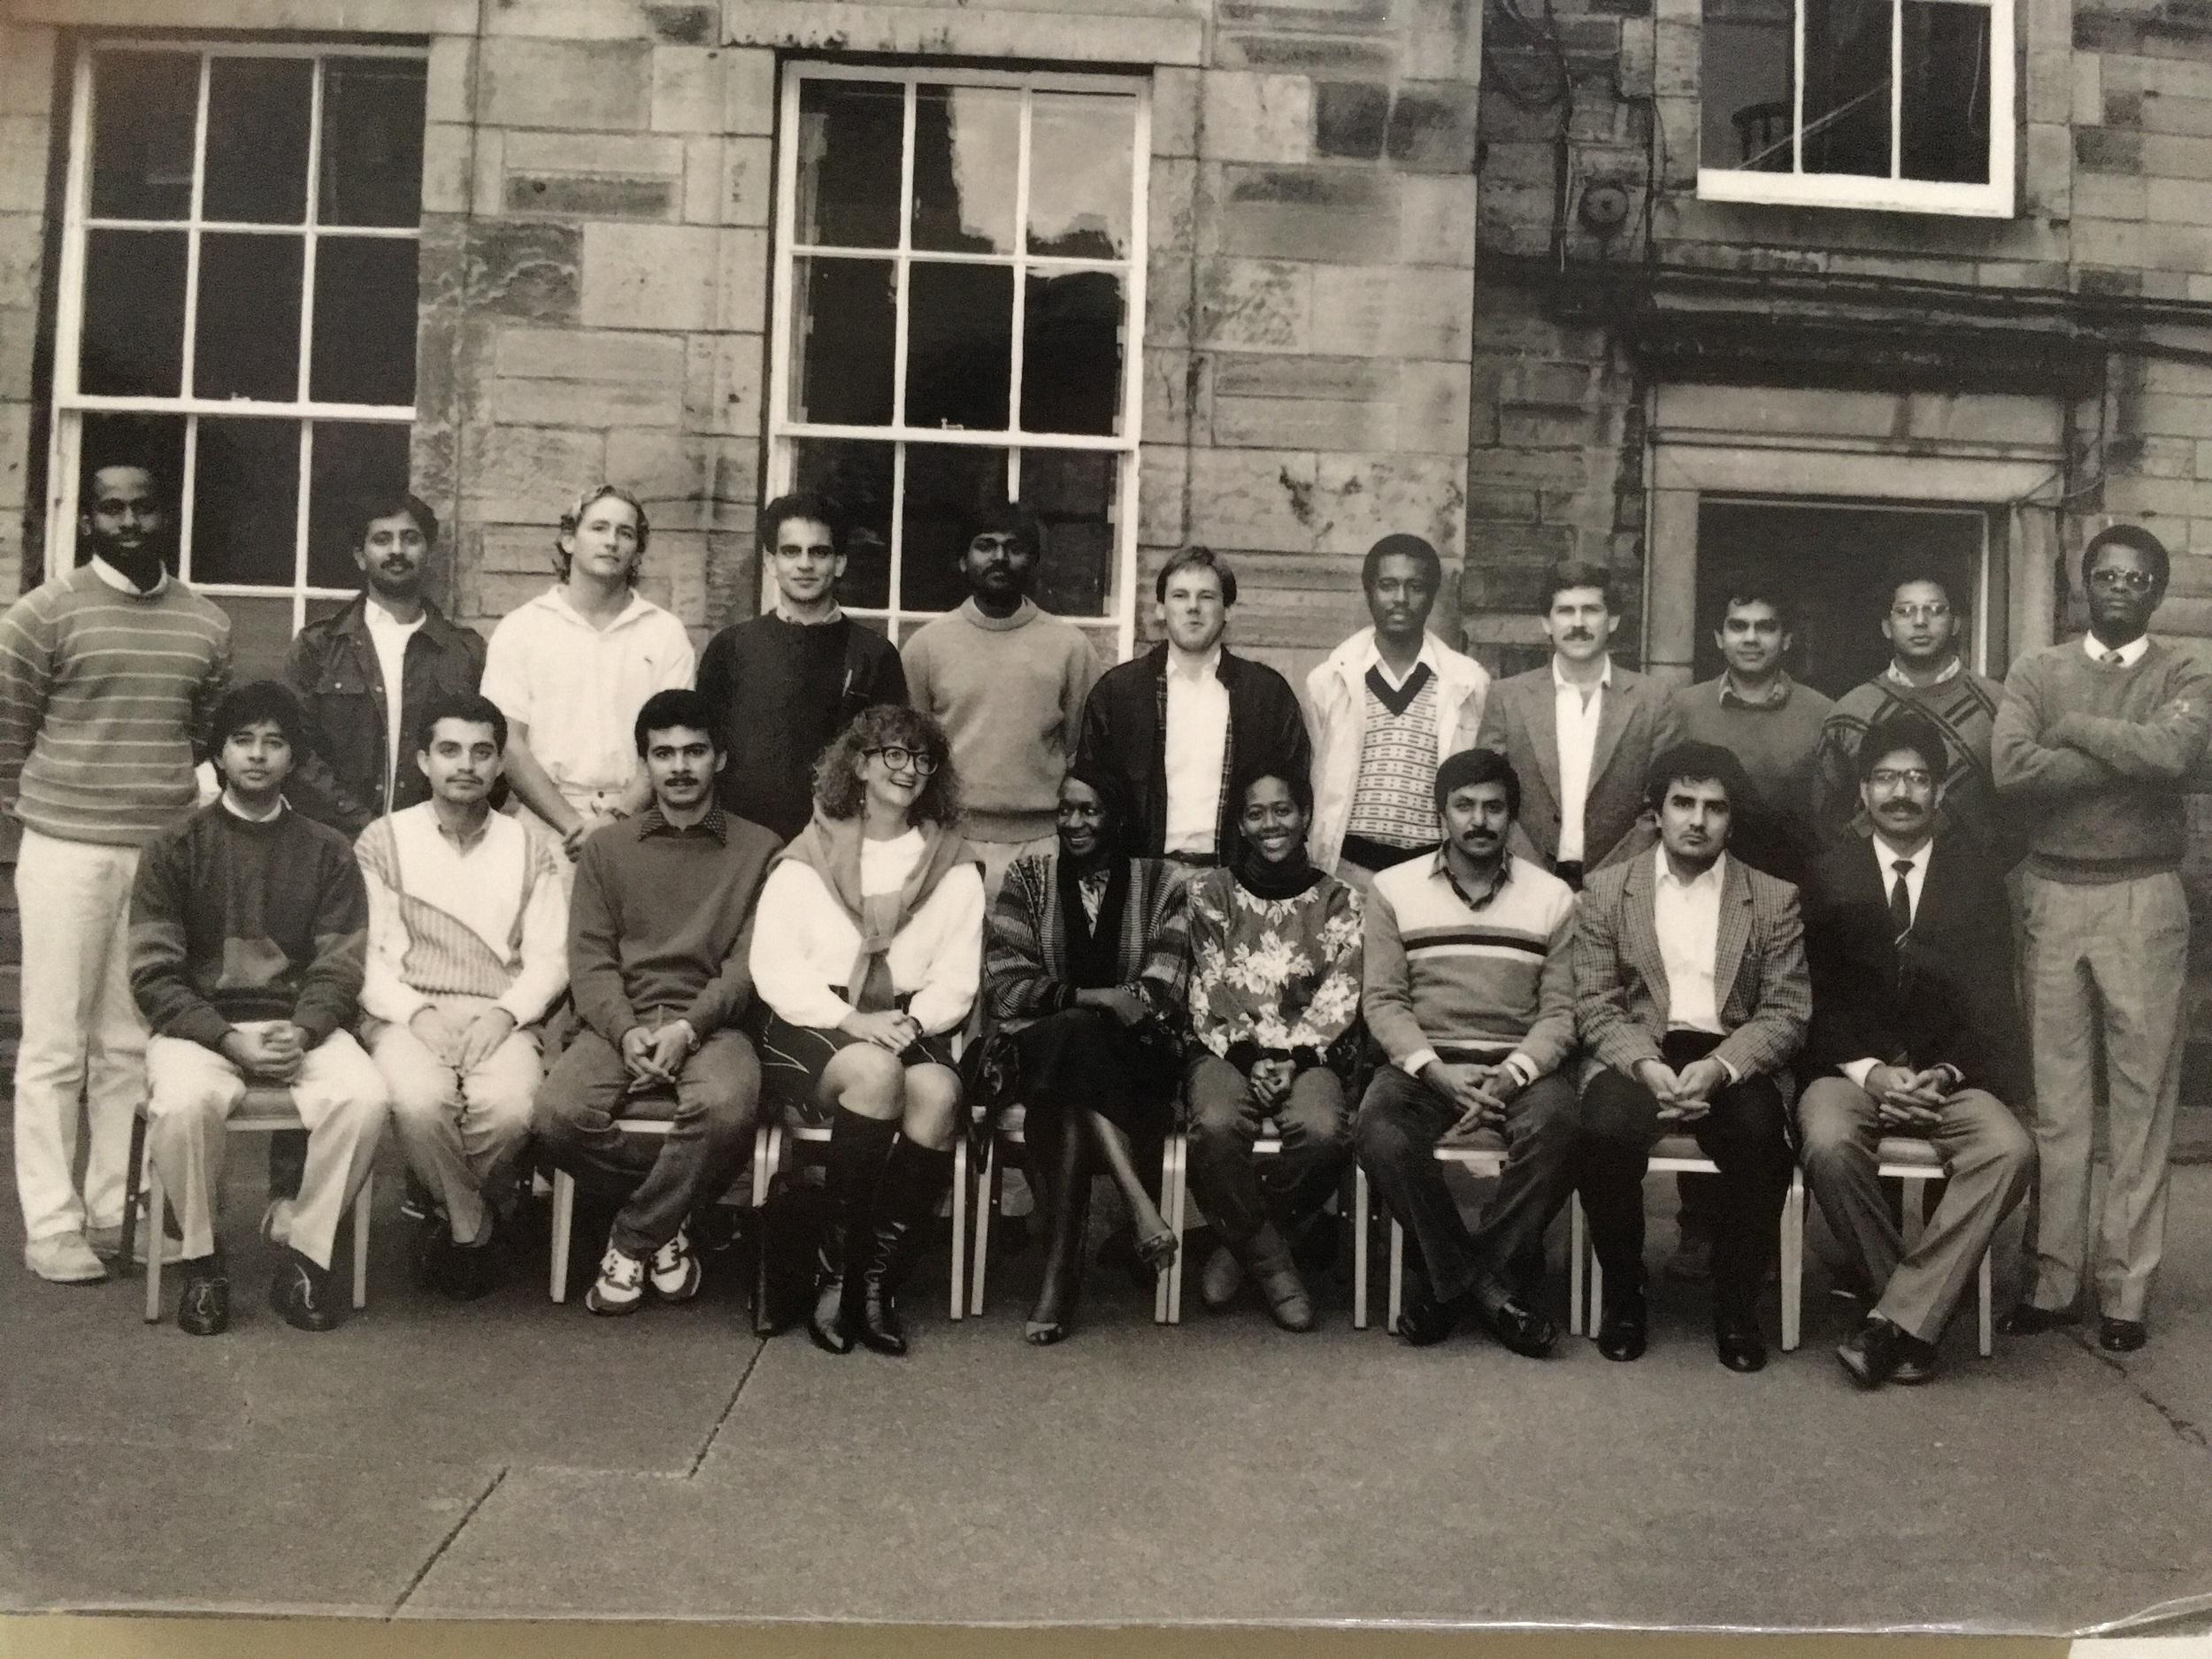 ROYAL COLLEGE OF SURGEONS OF EDINBURGH 1988-89